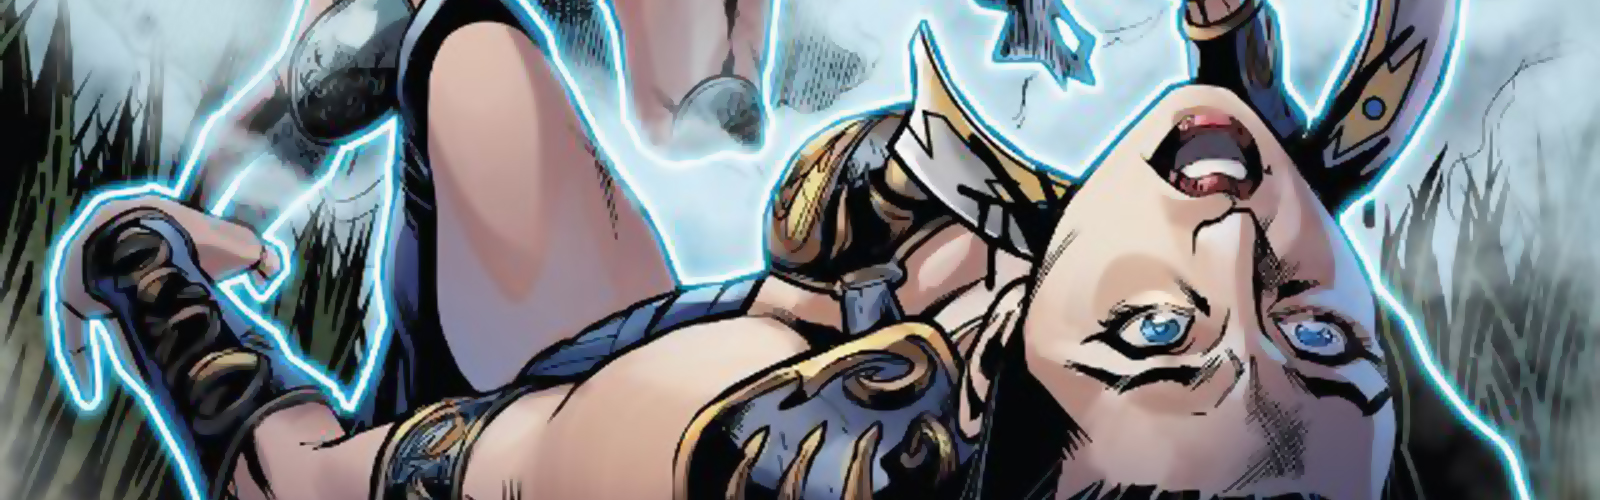 New Releases - 13-04-16: Xena - Warrior Princess